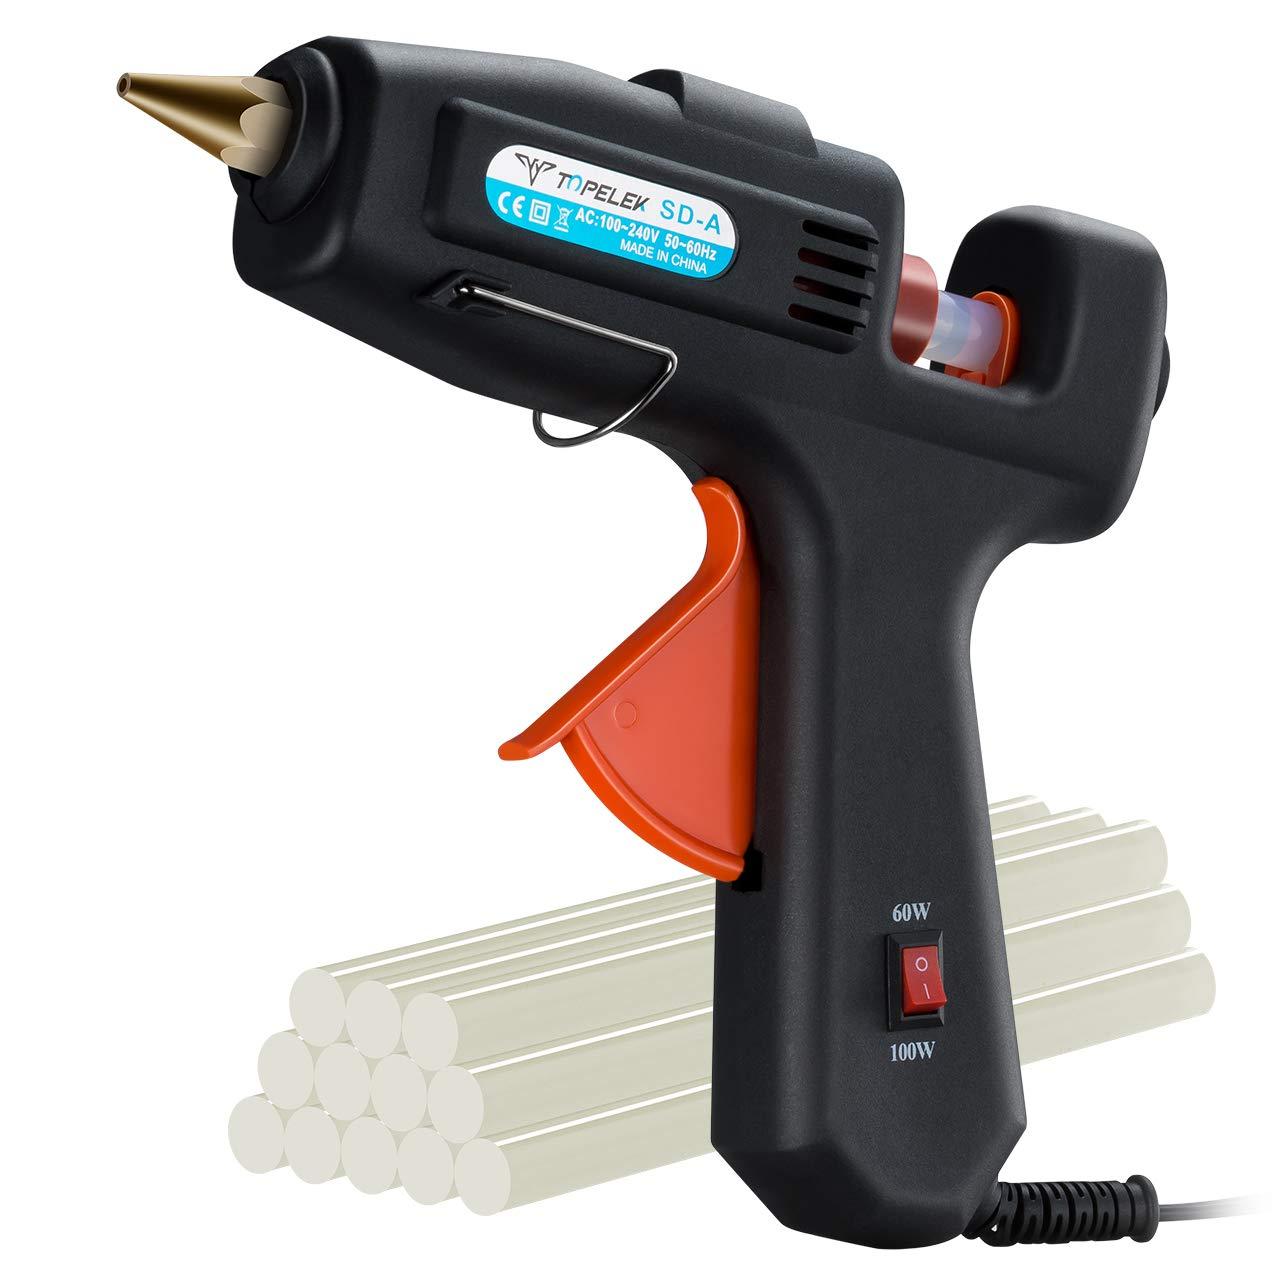 Hot Glue Gun, TopElek 60W/100W Dual Power Glue Gun with 12PCS Glue Sticks, Full Size (Not Mini) High Temperature Melt Glue Gun Kit, for DIY Small Crafts, Arts, Home Quick Repairs, Festival Decoration